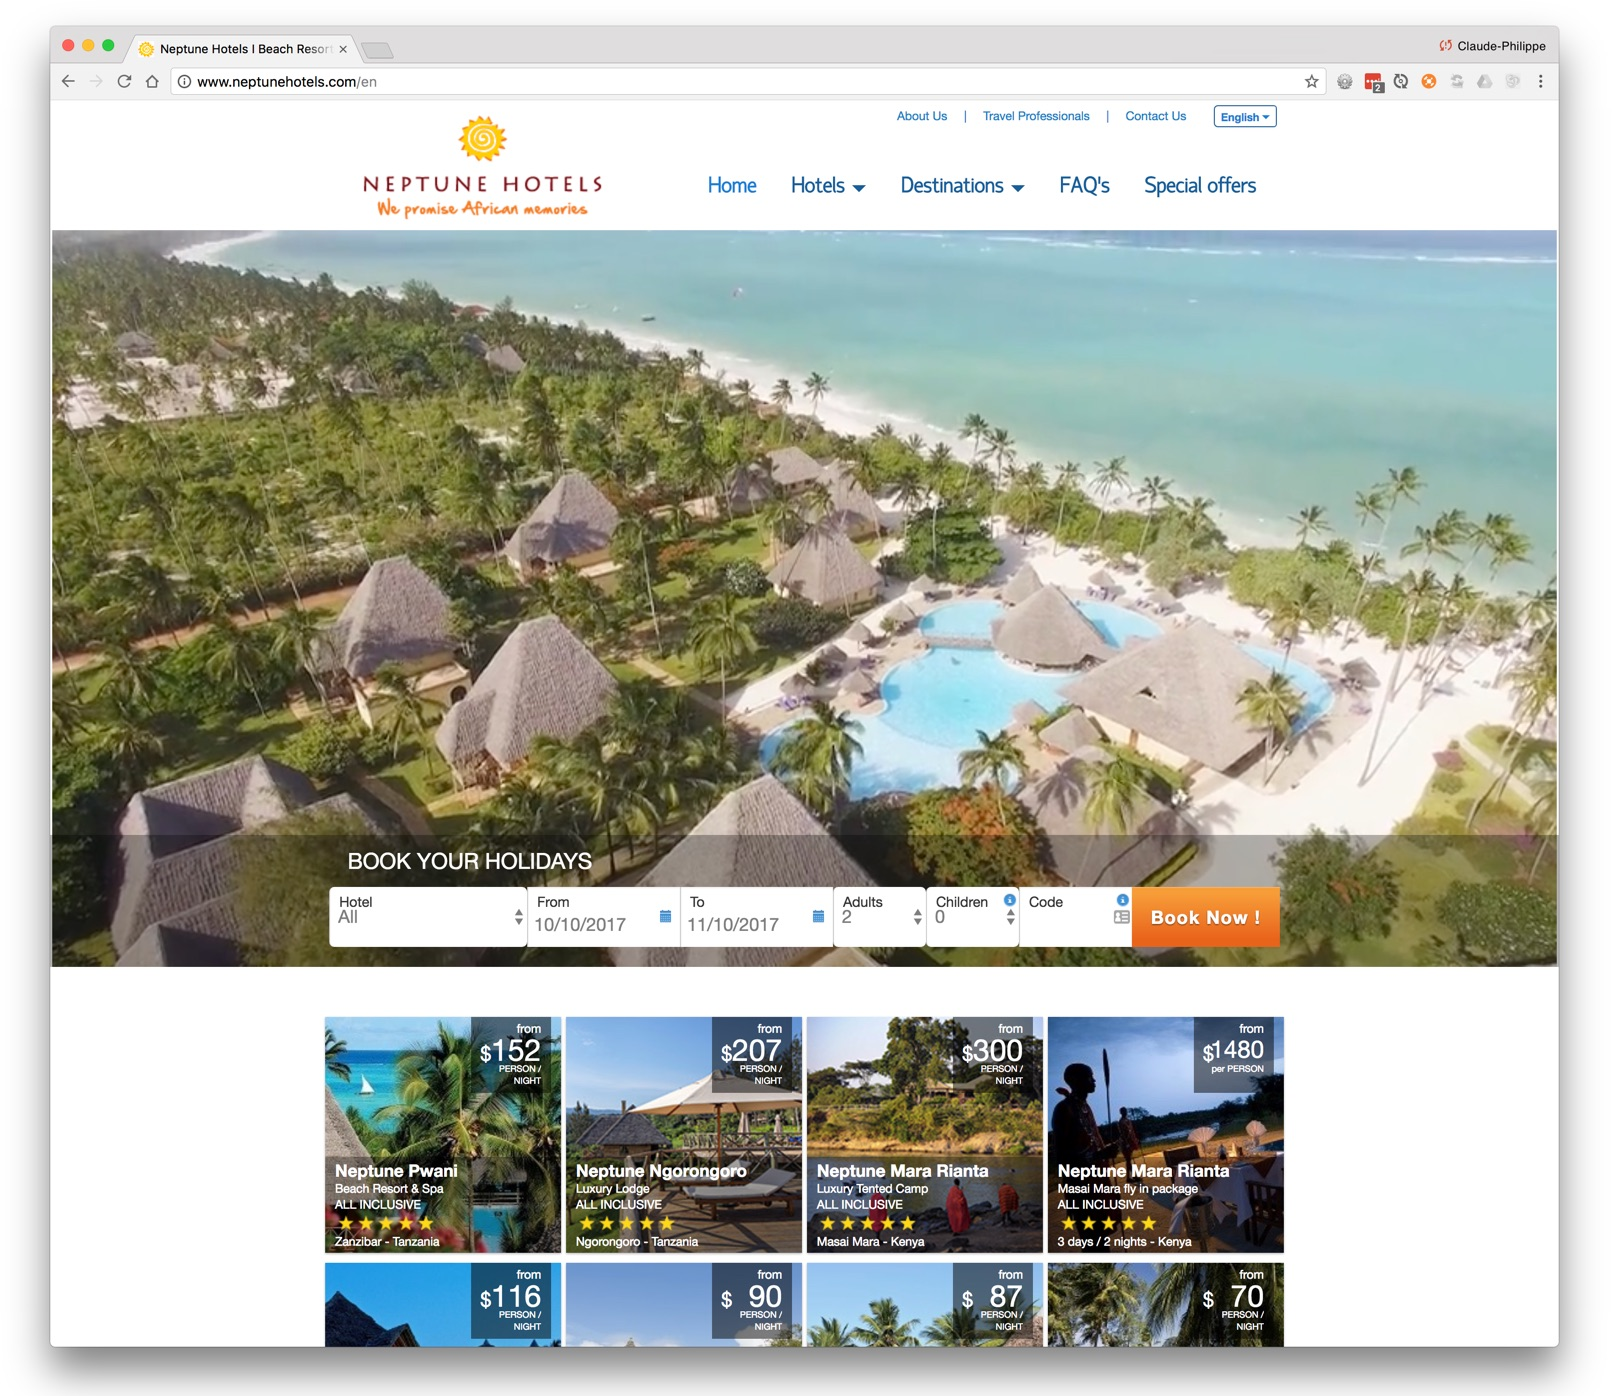 Neptune Hotels website